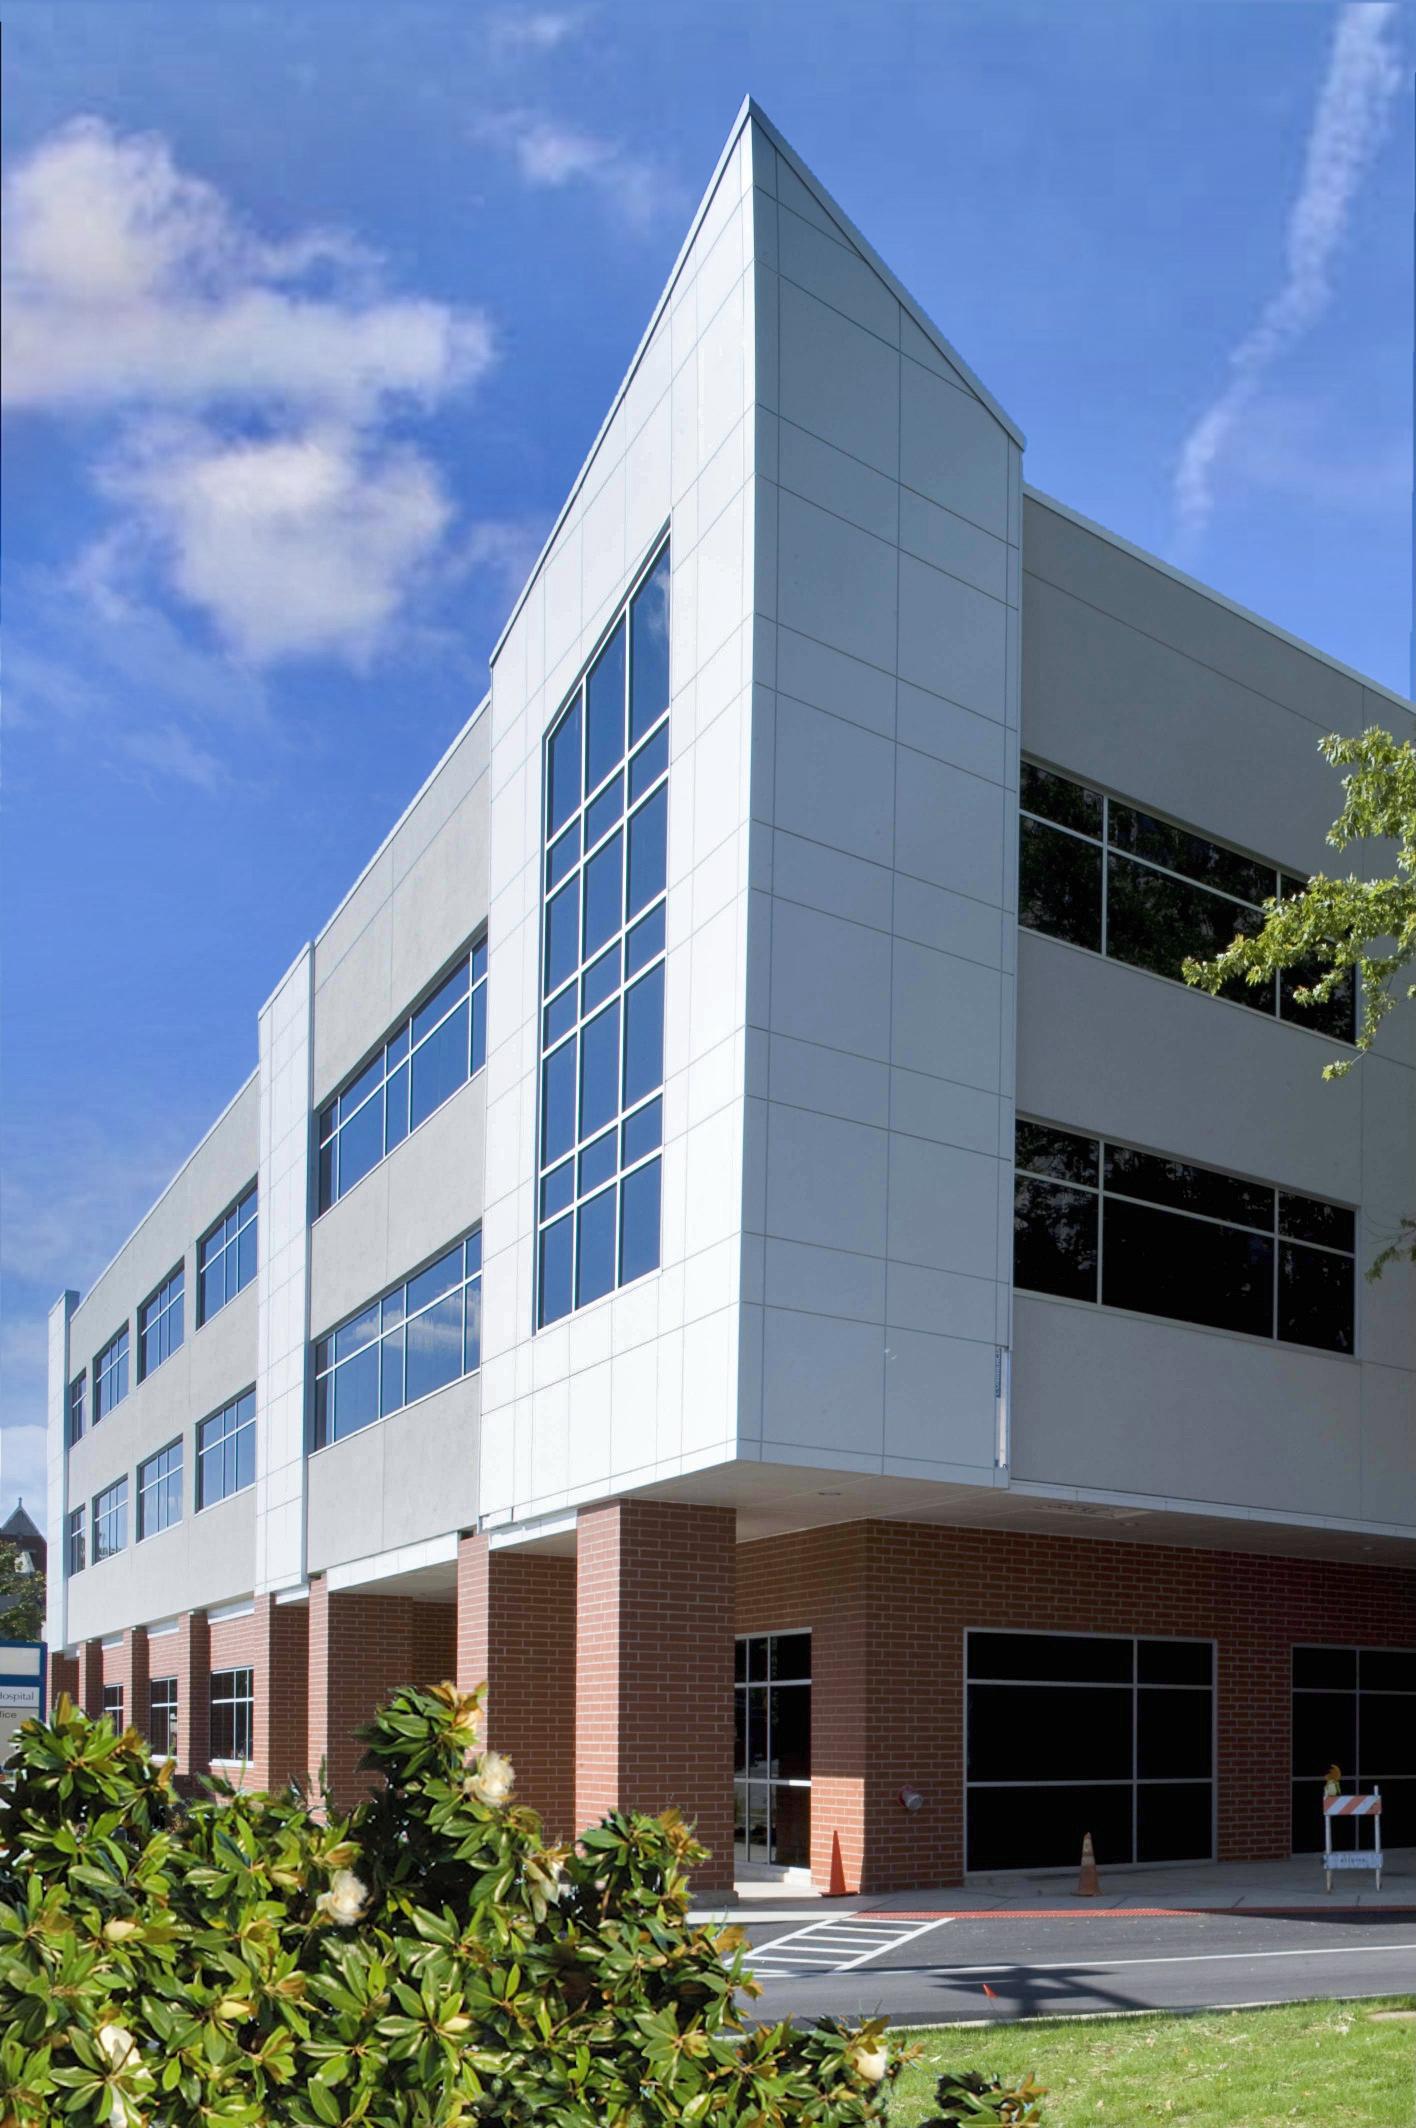 St. Joseph Hospital Medical Office Building